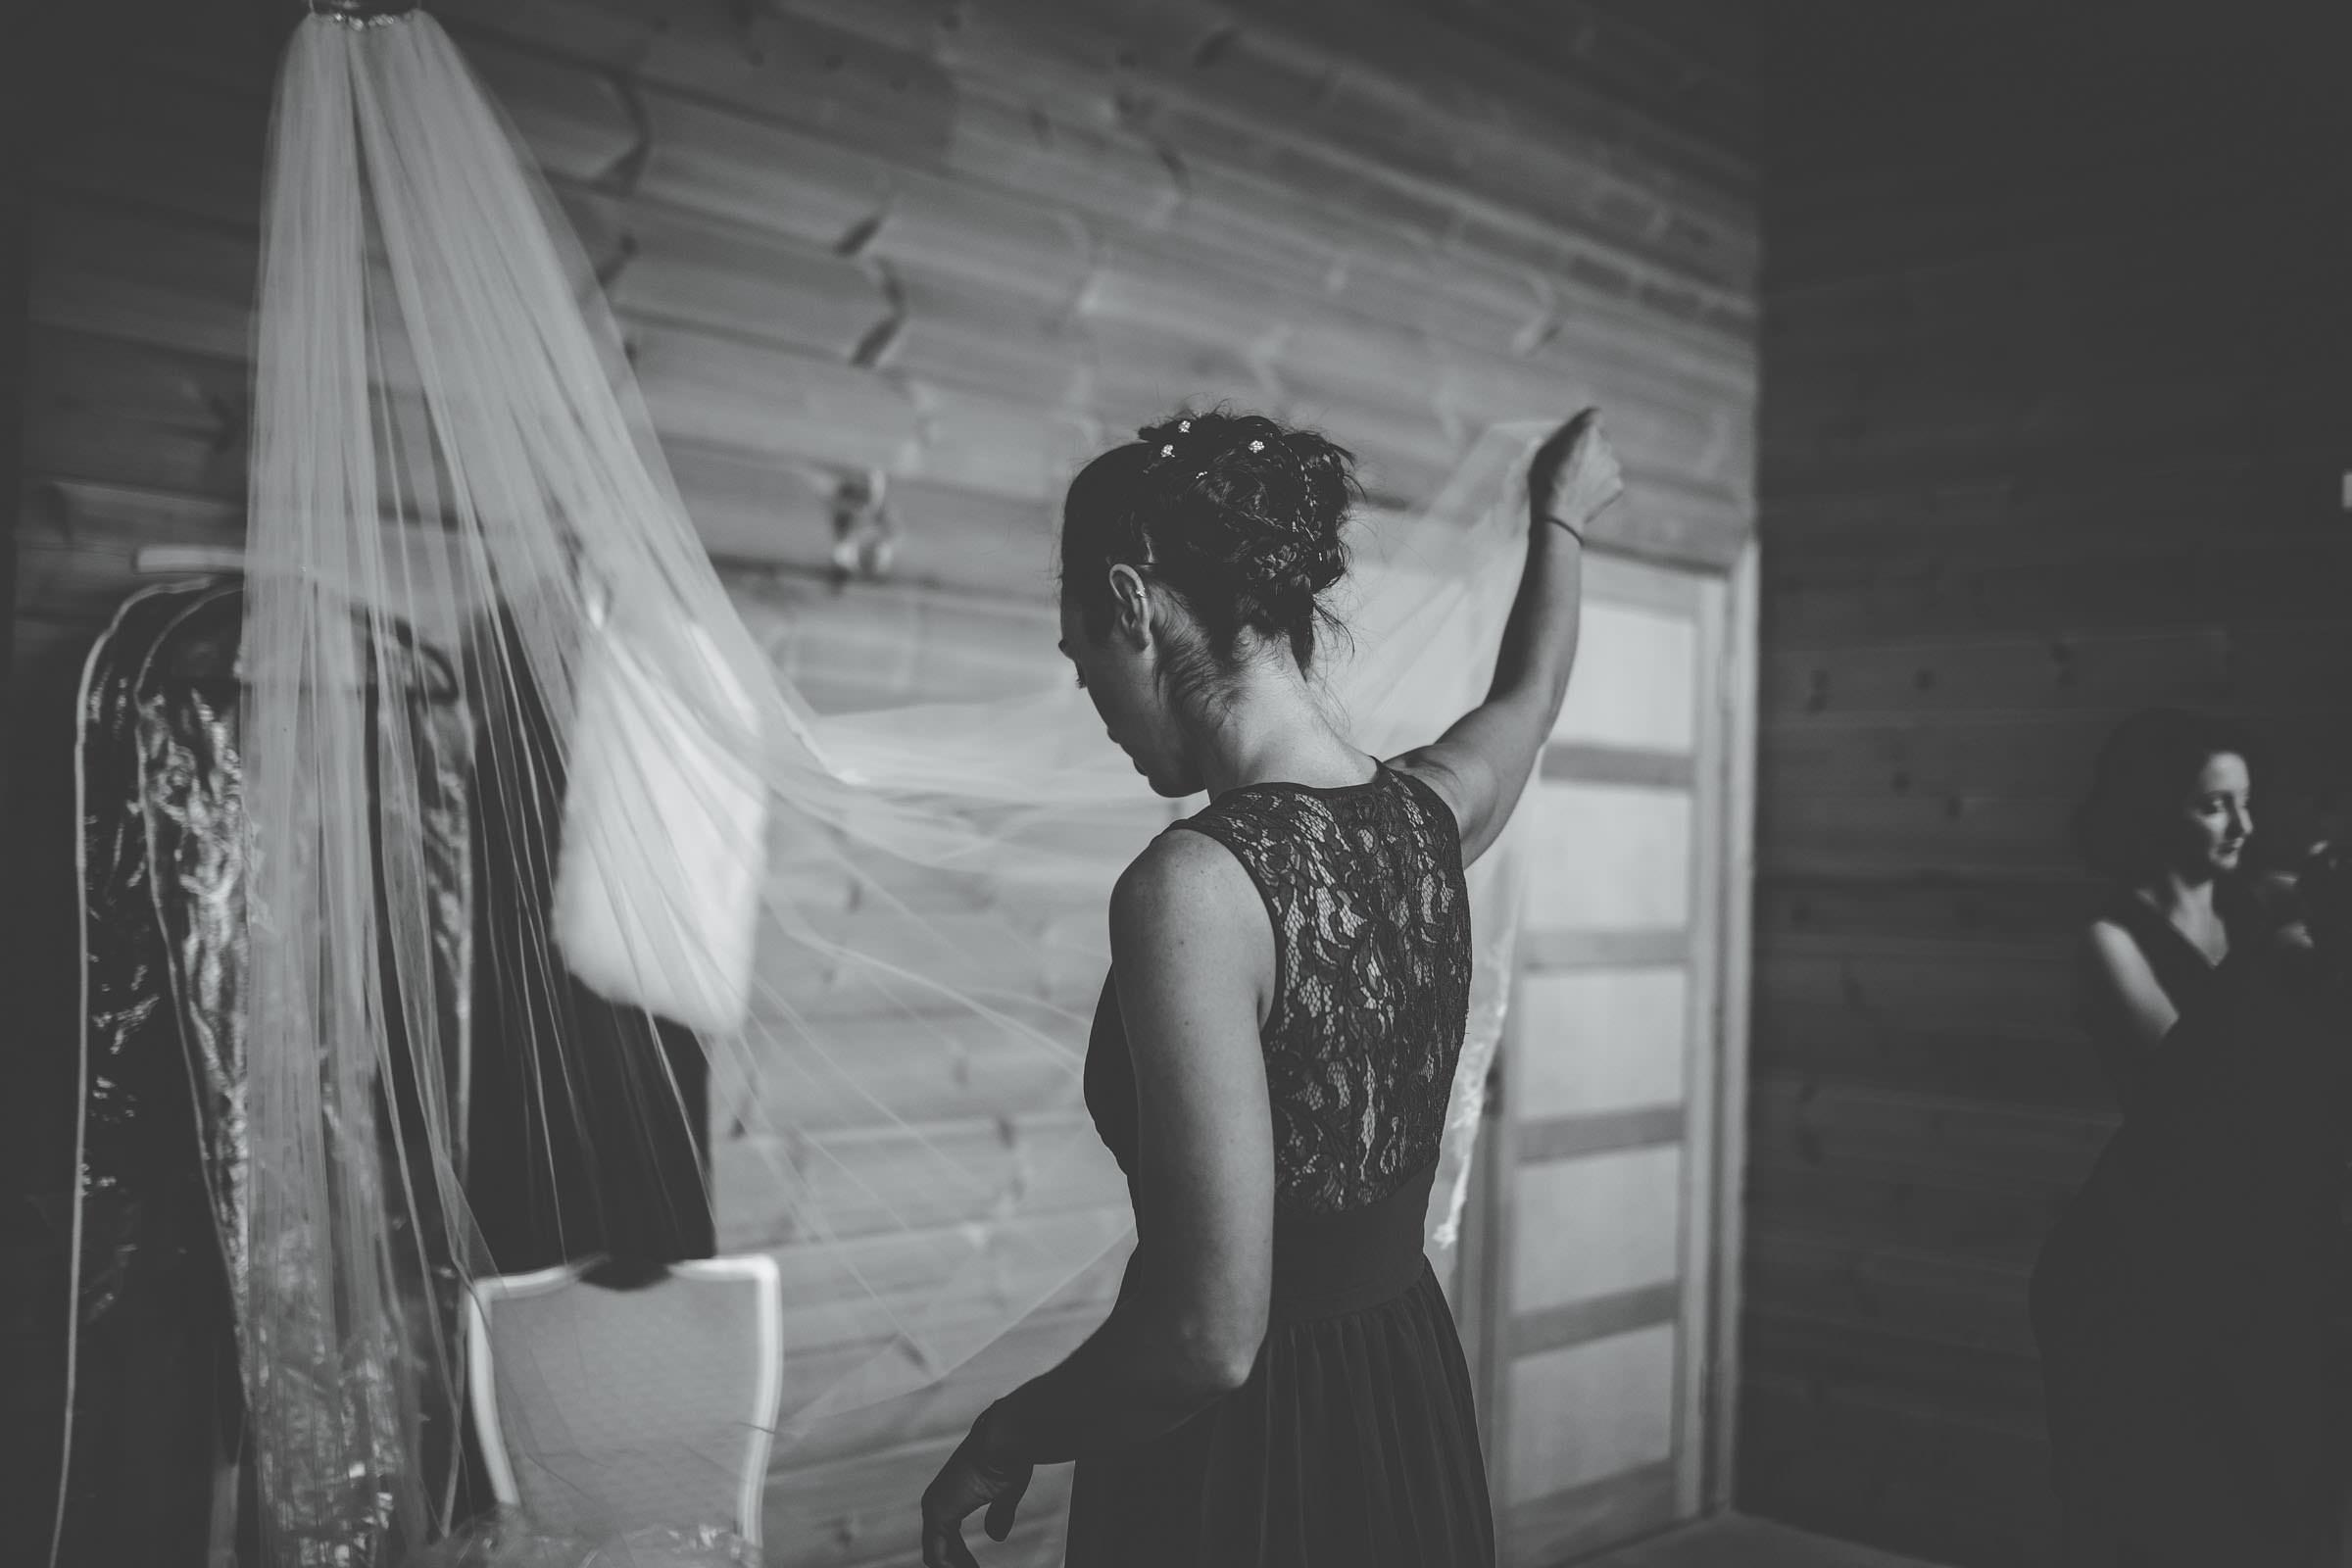 veil bridesmaid holding it up.